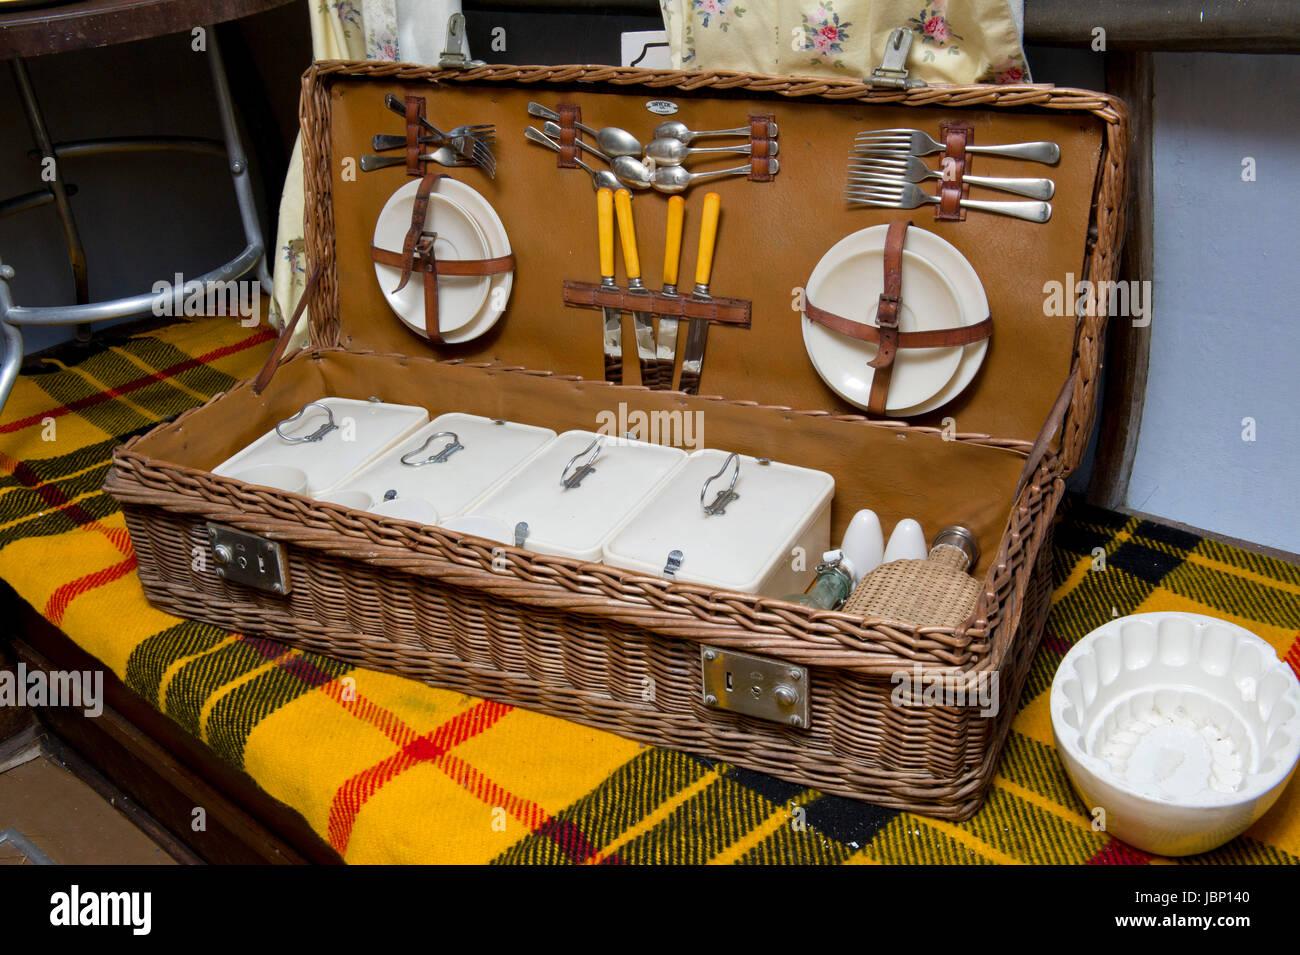 A vintage picnic basket - Stock Image